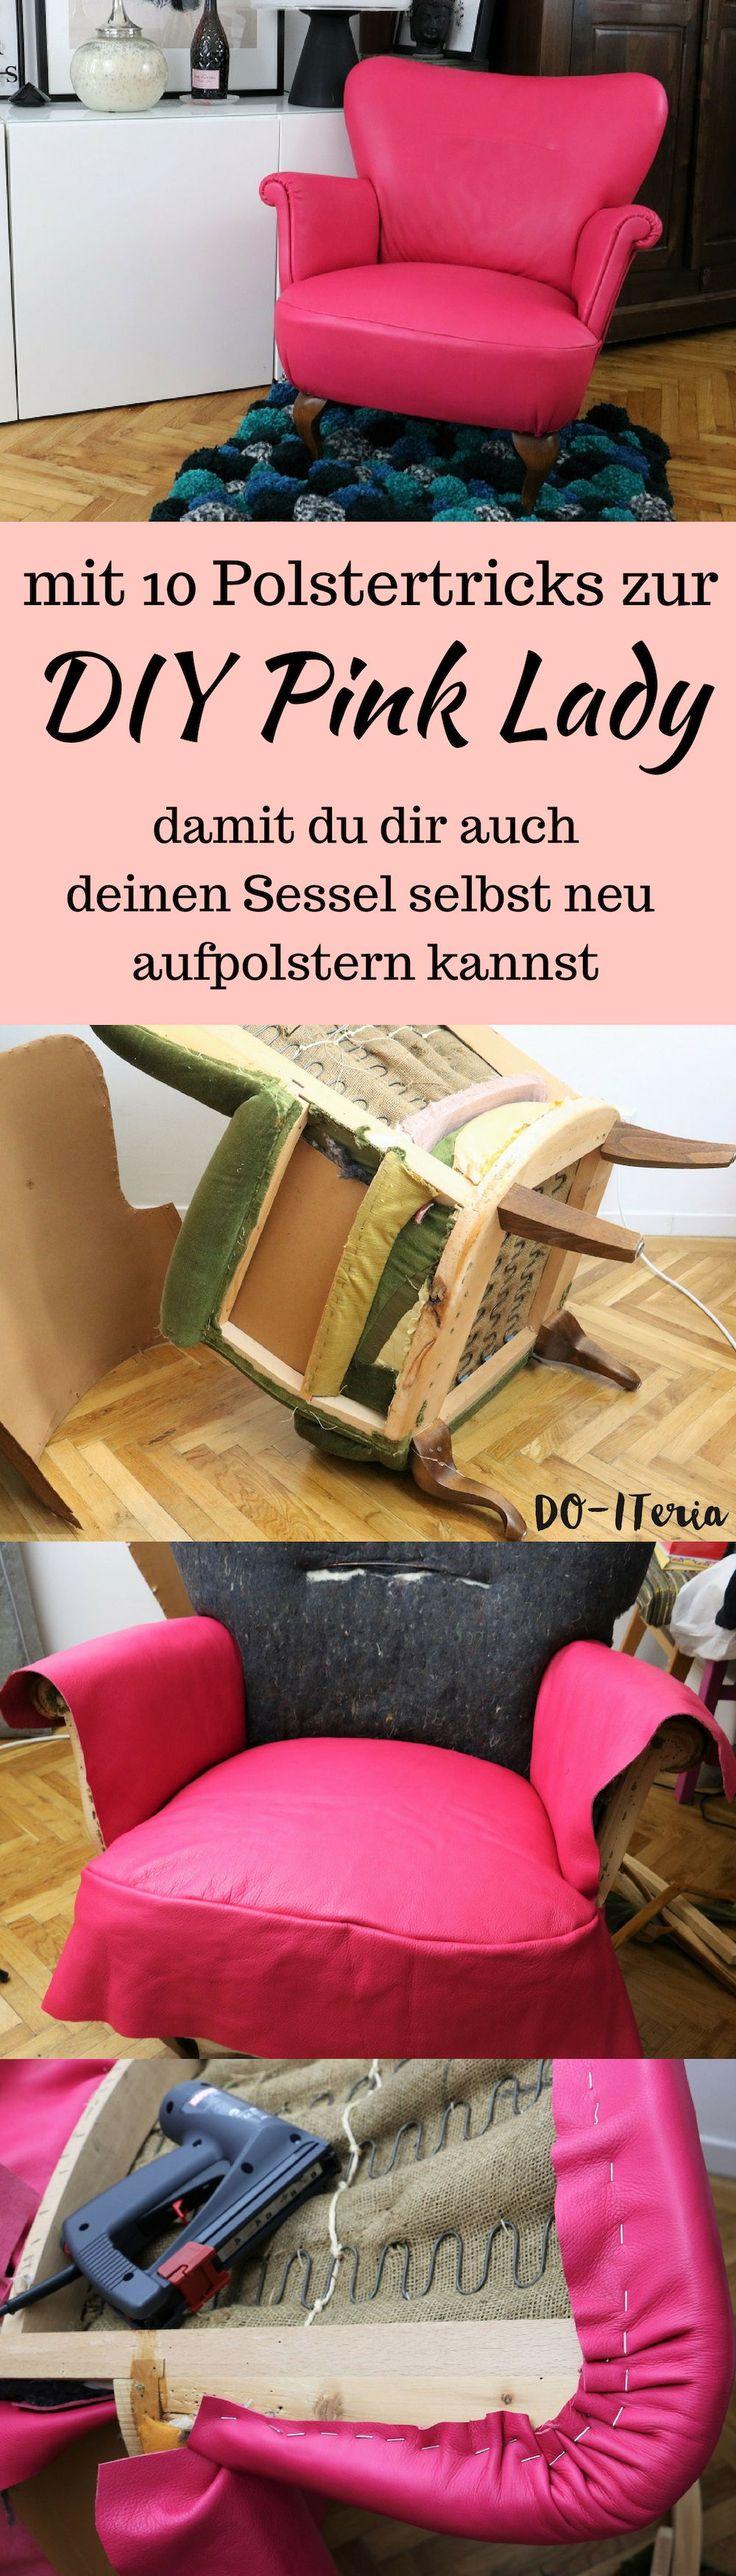 Repeat Act Armchair Upholstery – 10 Polstertricks für Ihre eigene Pink Lady